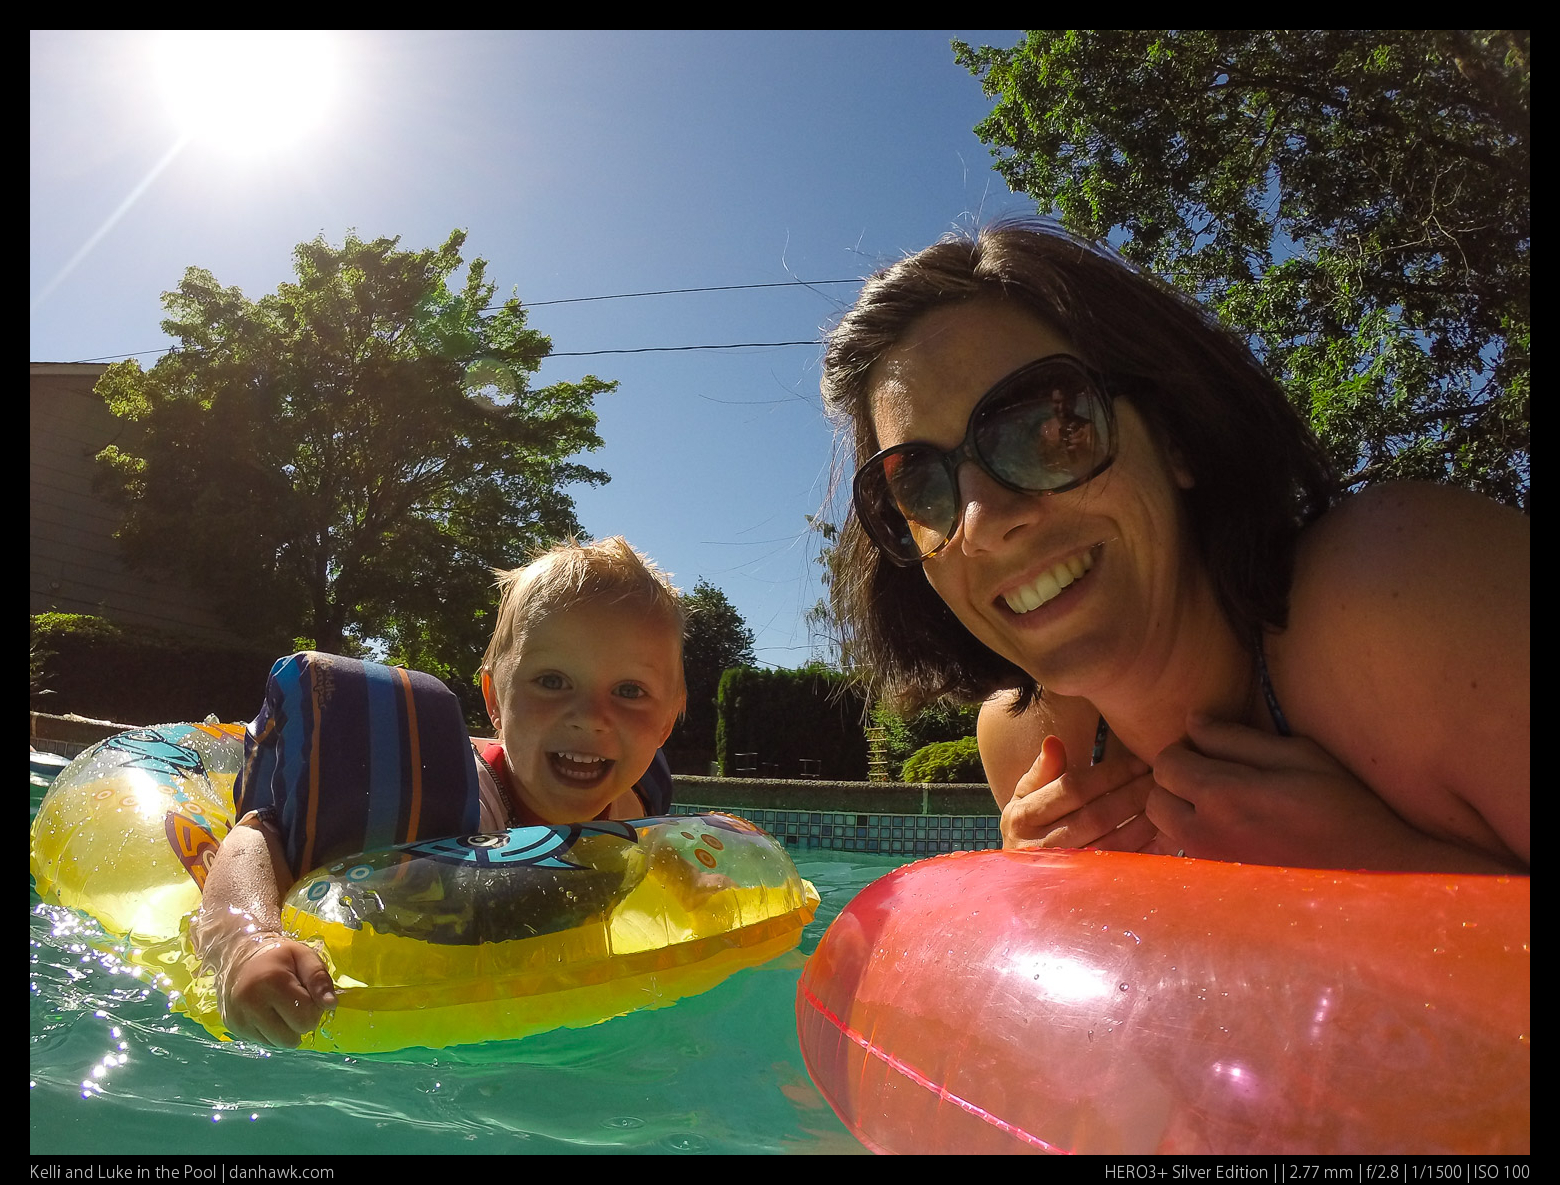 Kelli and Luke in the Pool